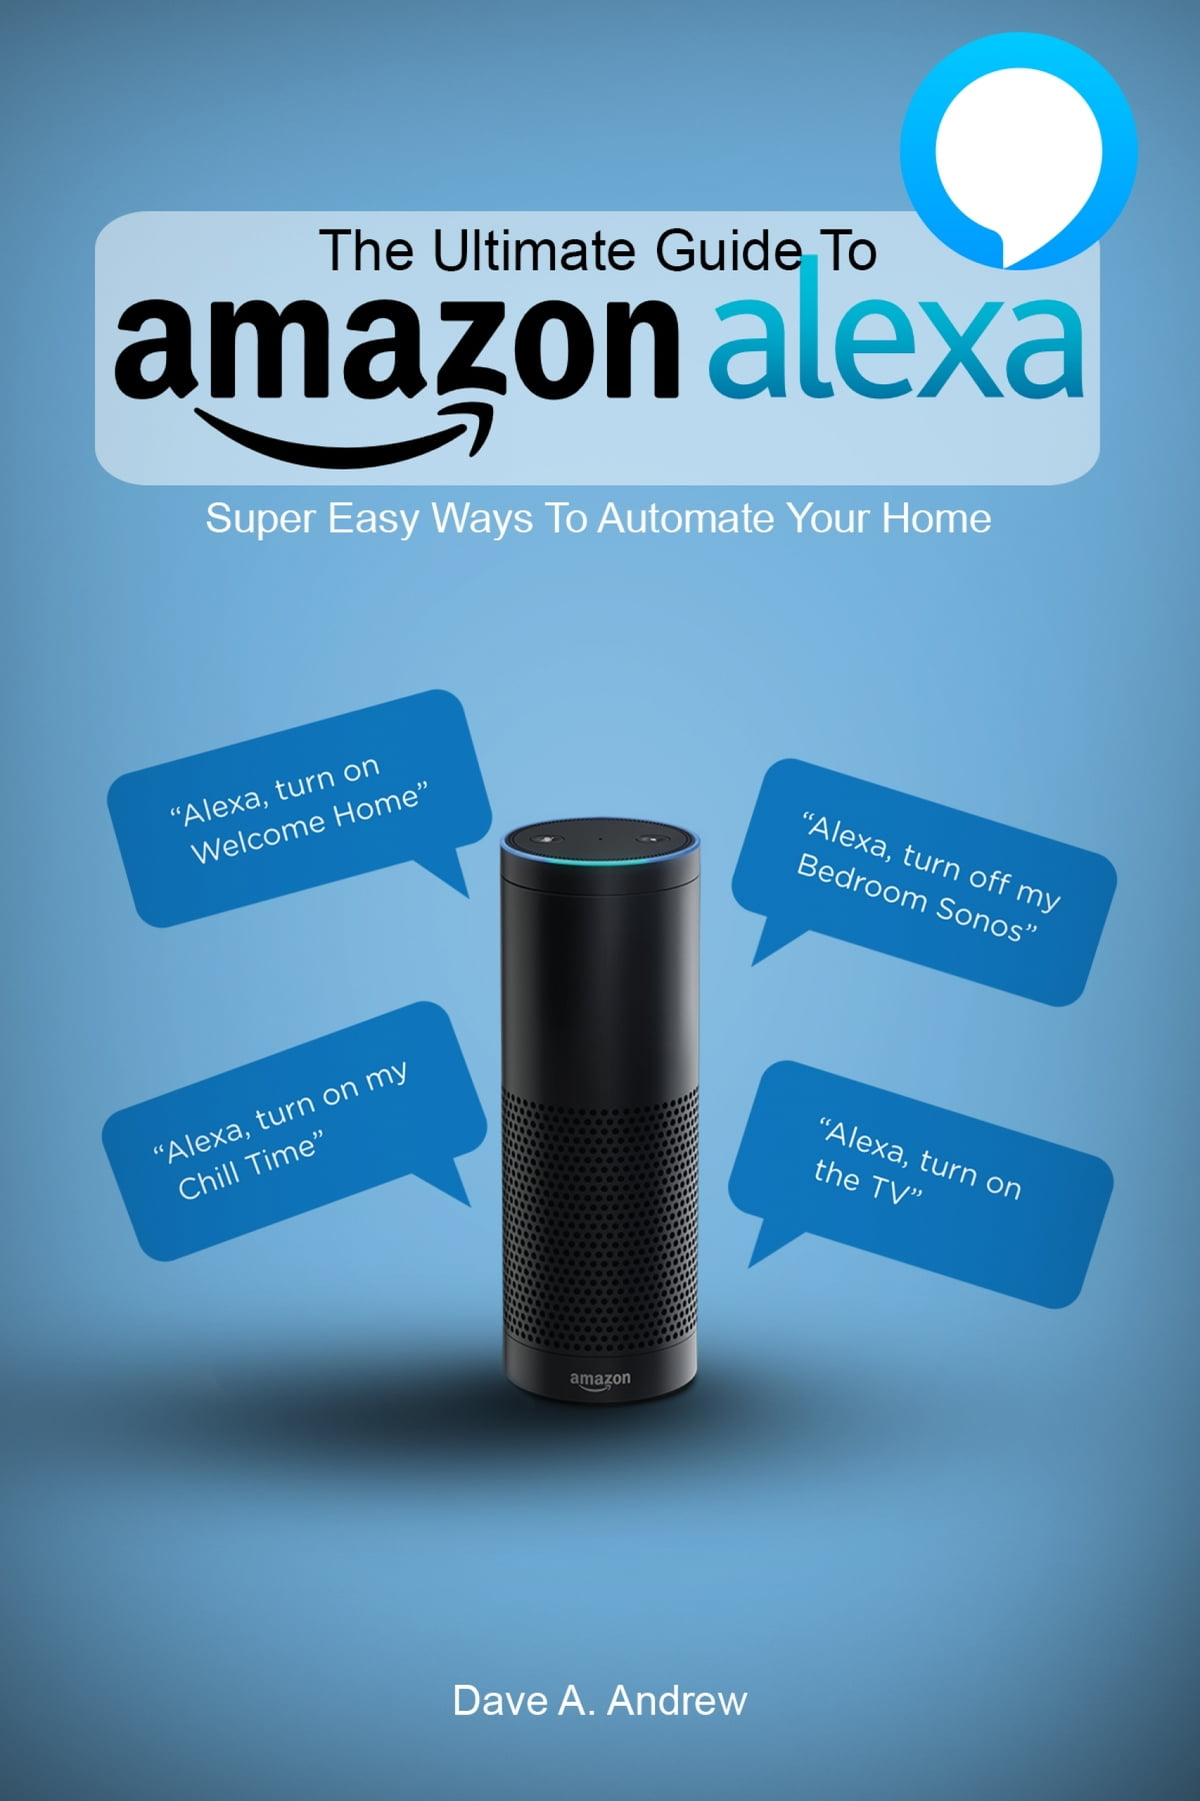 The Ultimate Guide To Amazon Alexa eBook by Dave Andrew - 6610000085279 | Rakuten Kobo